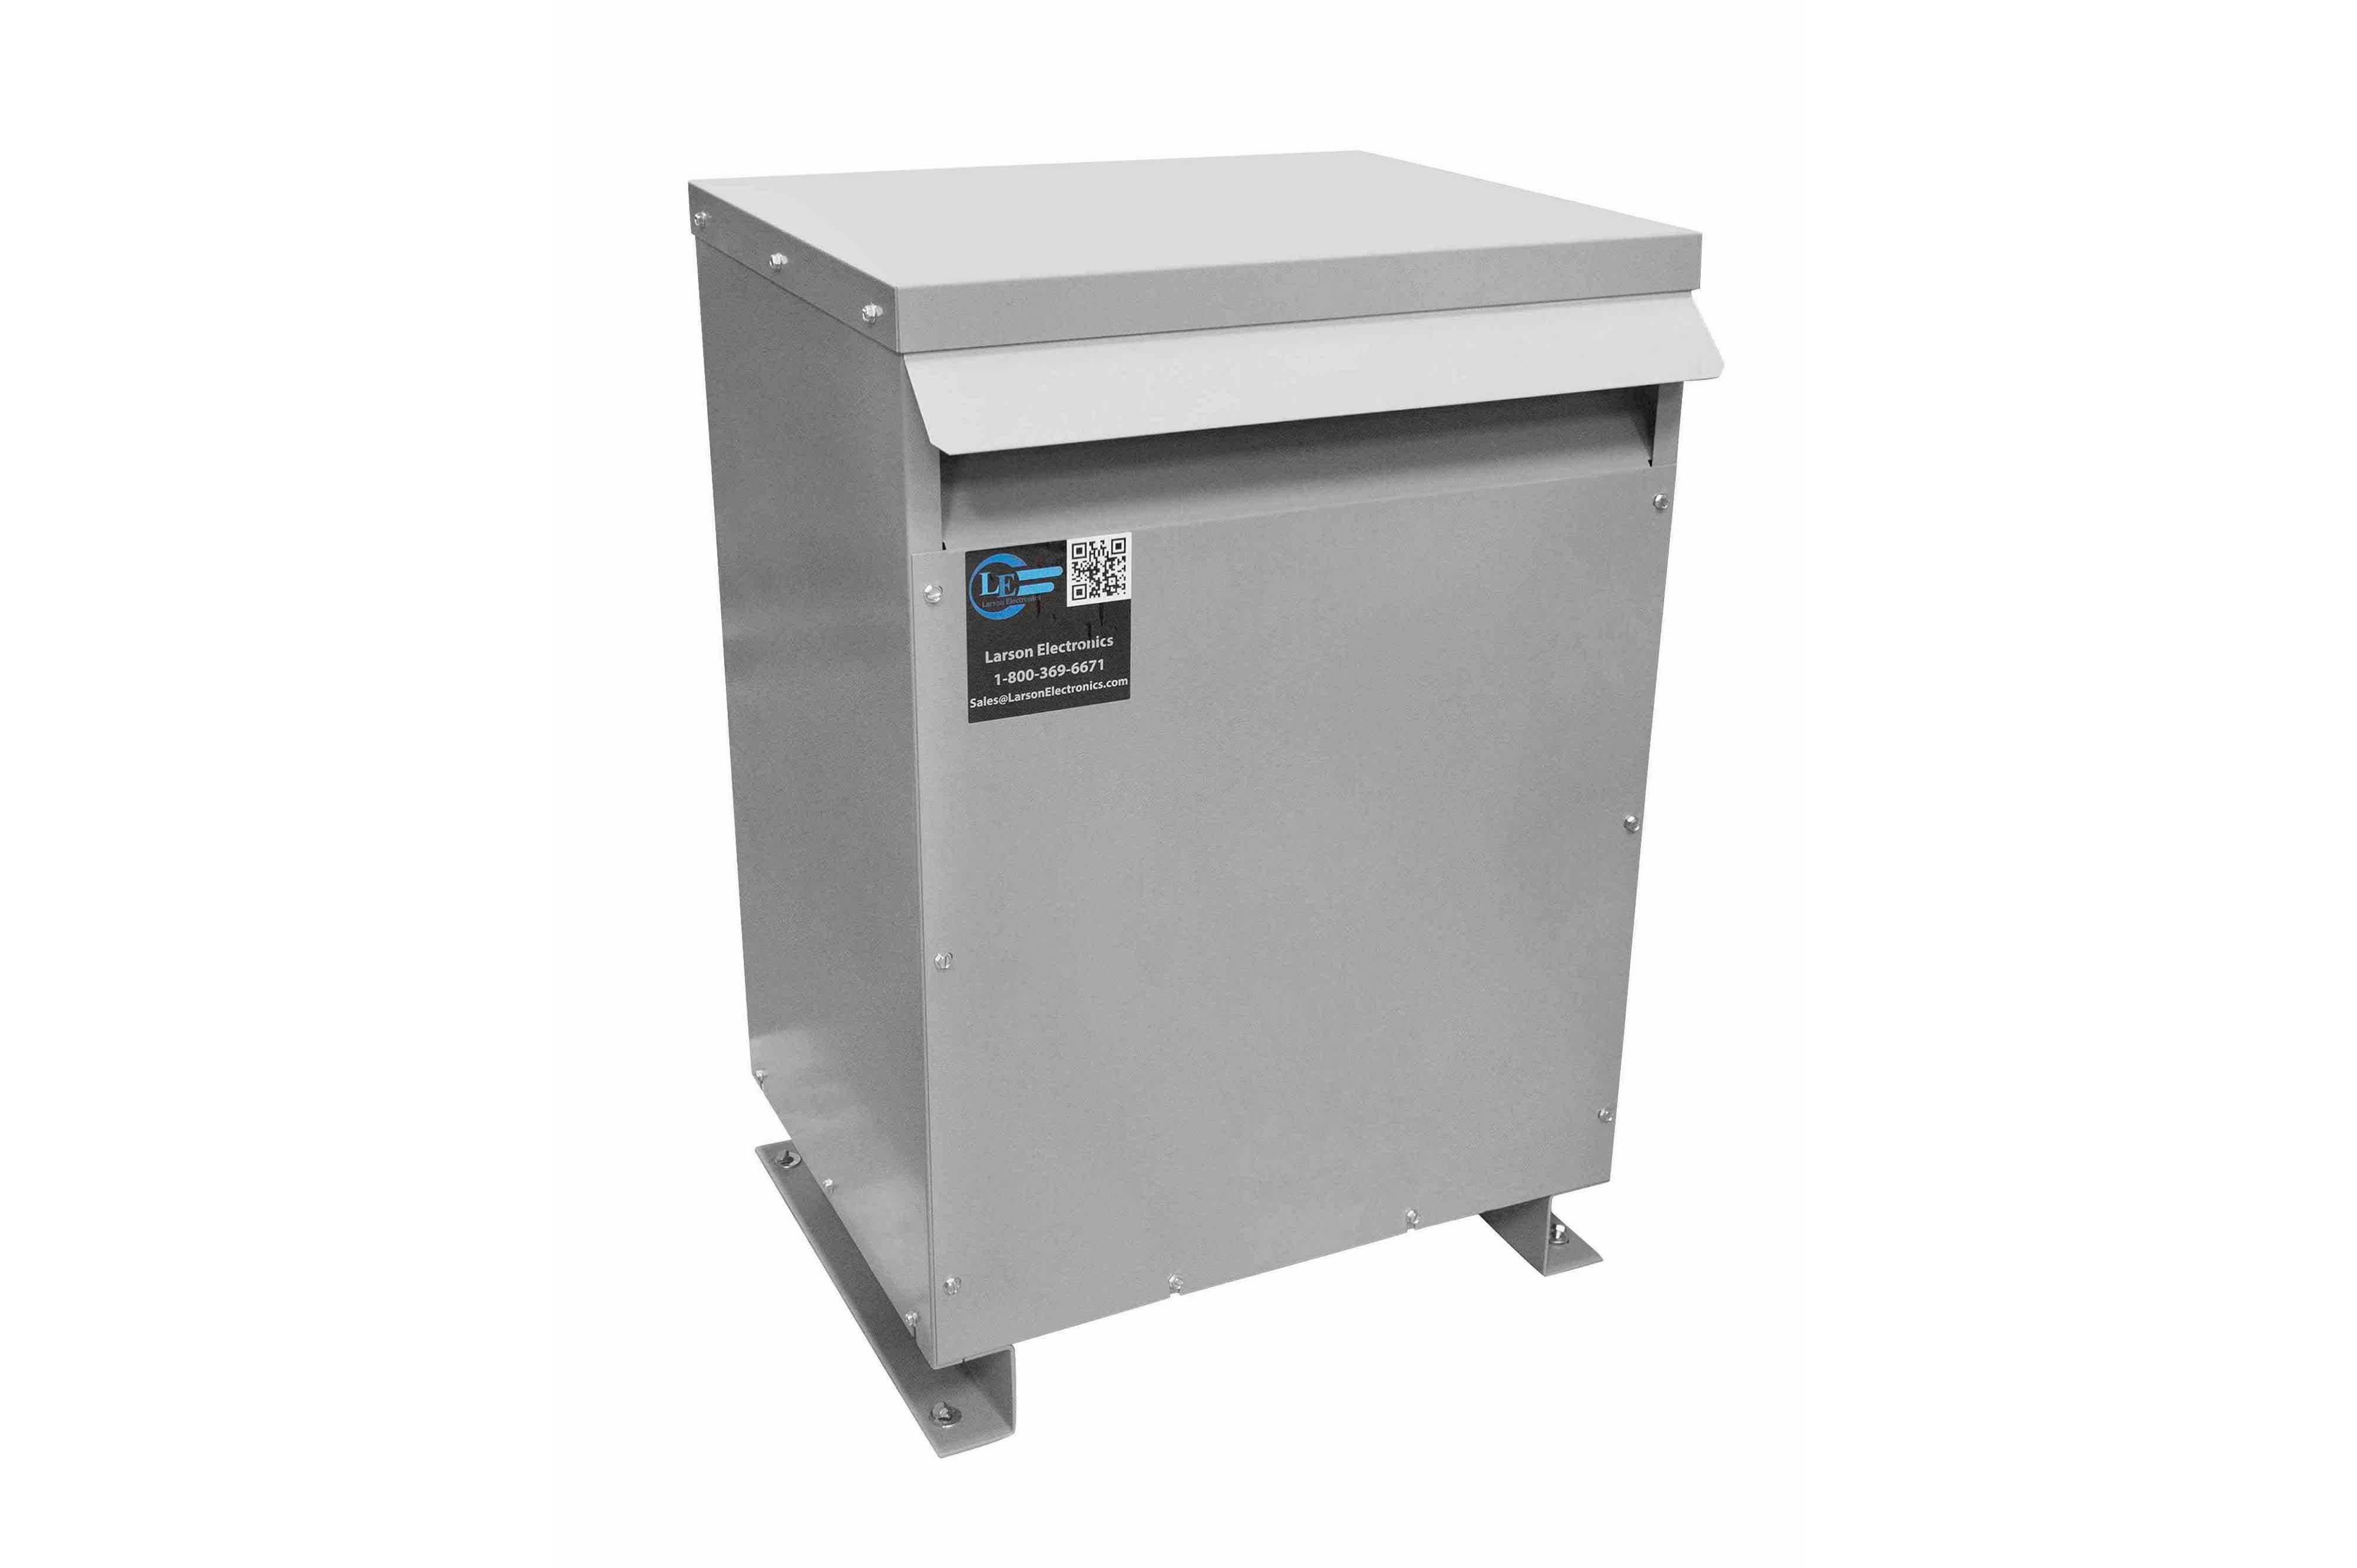 32.5 kVA 3PH Isolation Transformer, 415V Wye Primary, 480V Delta Secondary, N3R, Ventilated, 60 Hz